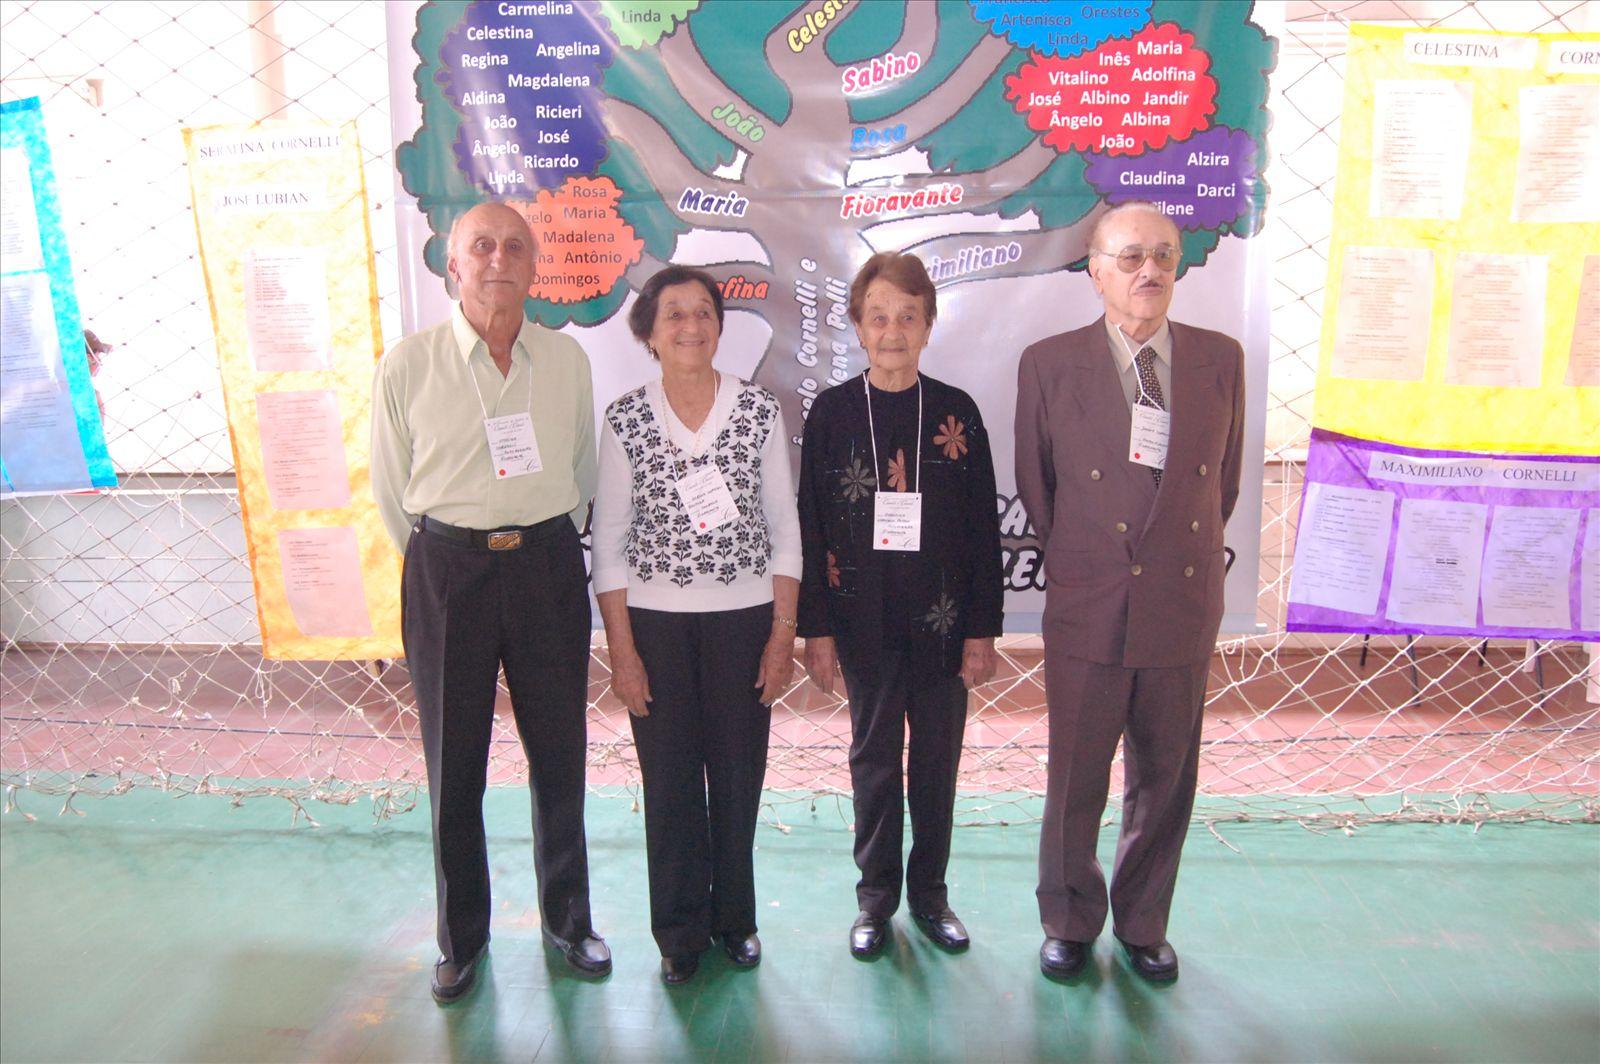 2º Encontro Família Cornelli - 11.10.2009 (68)_0